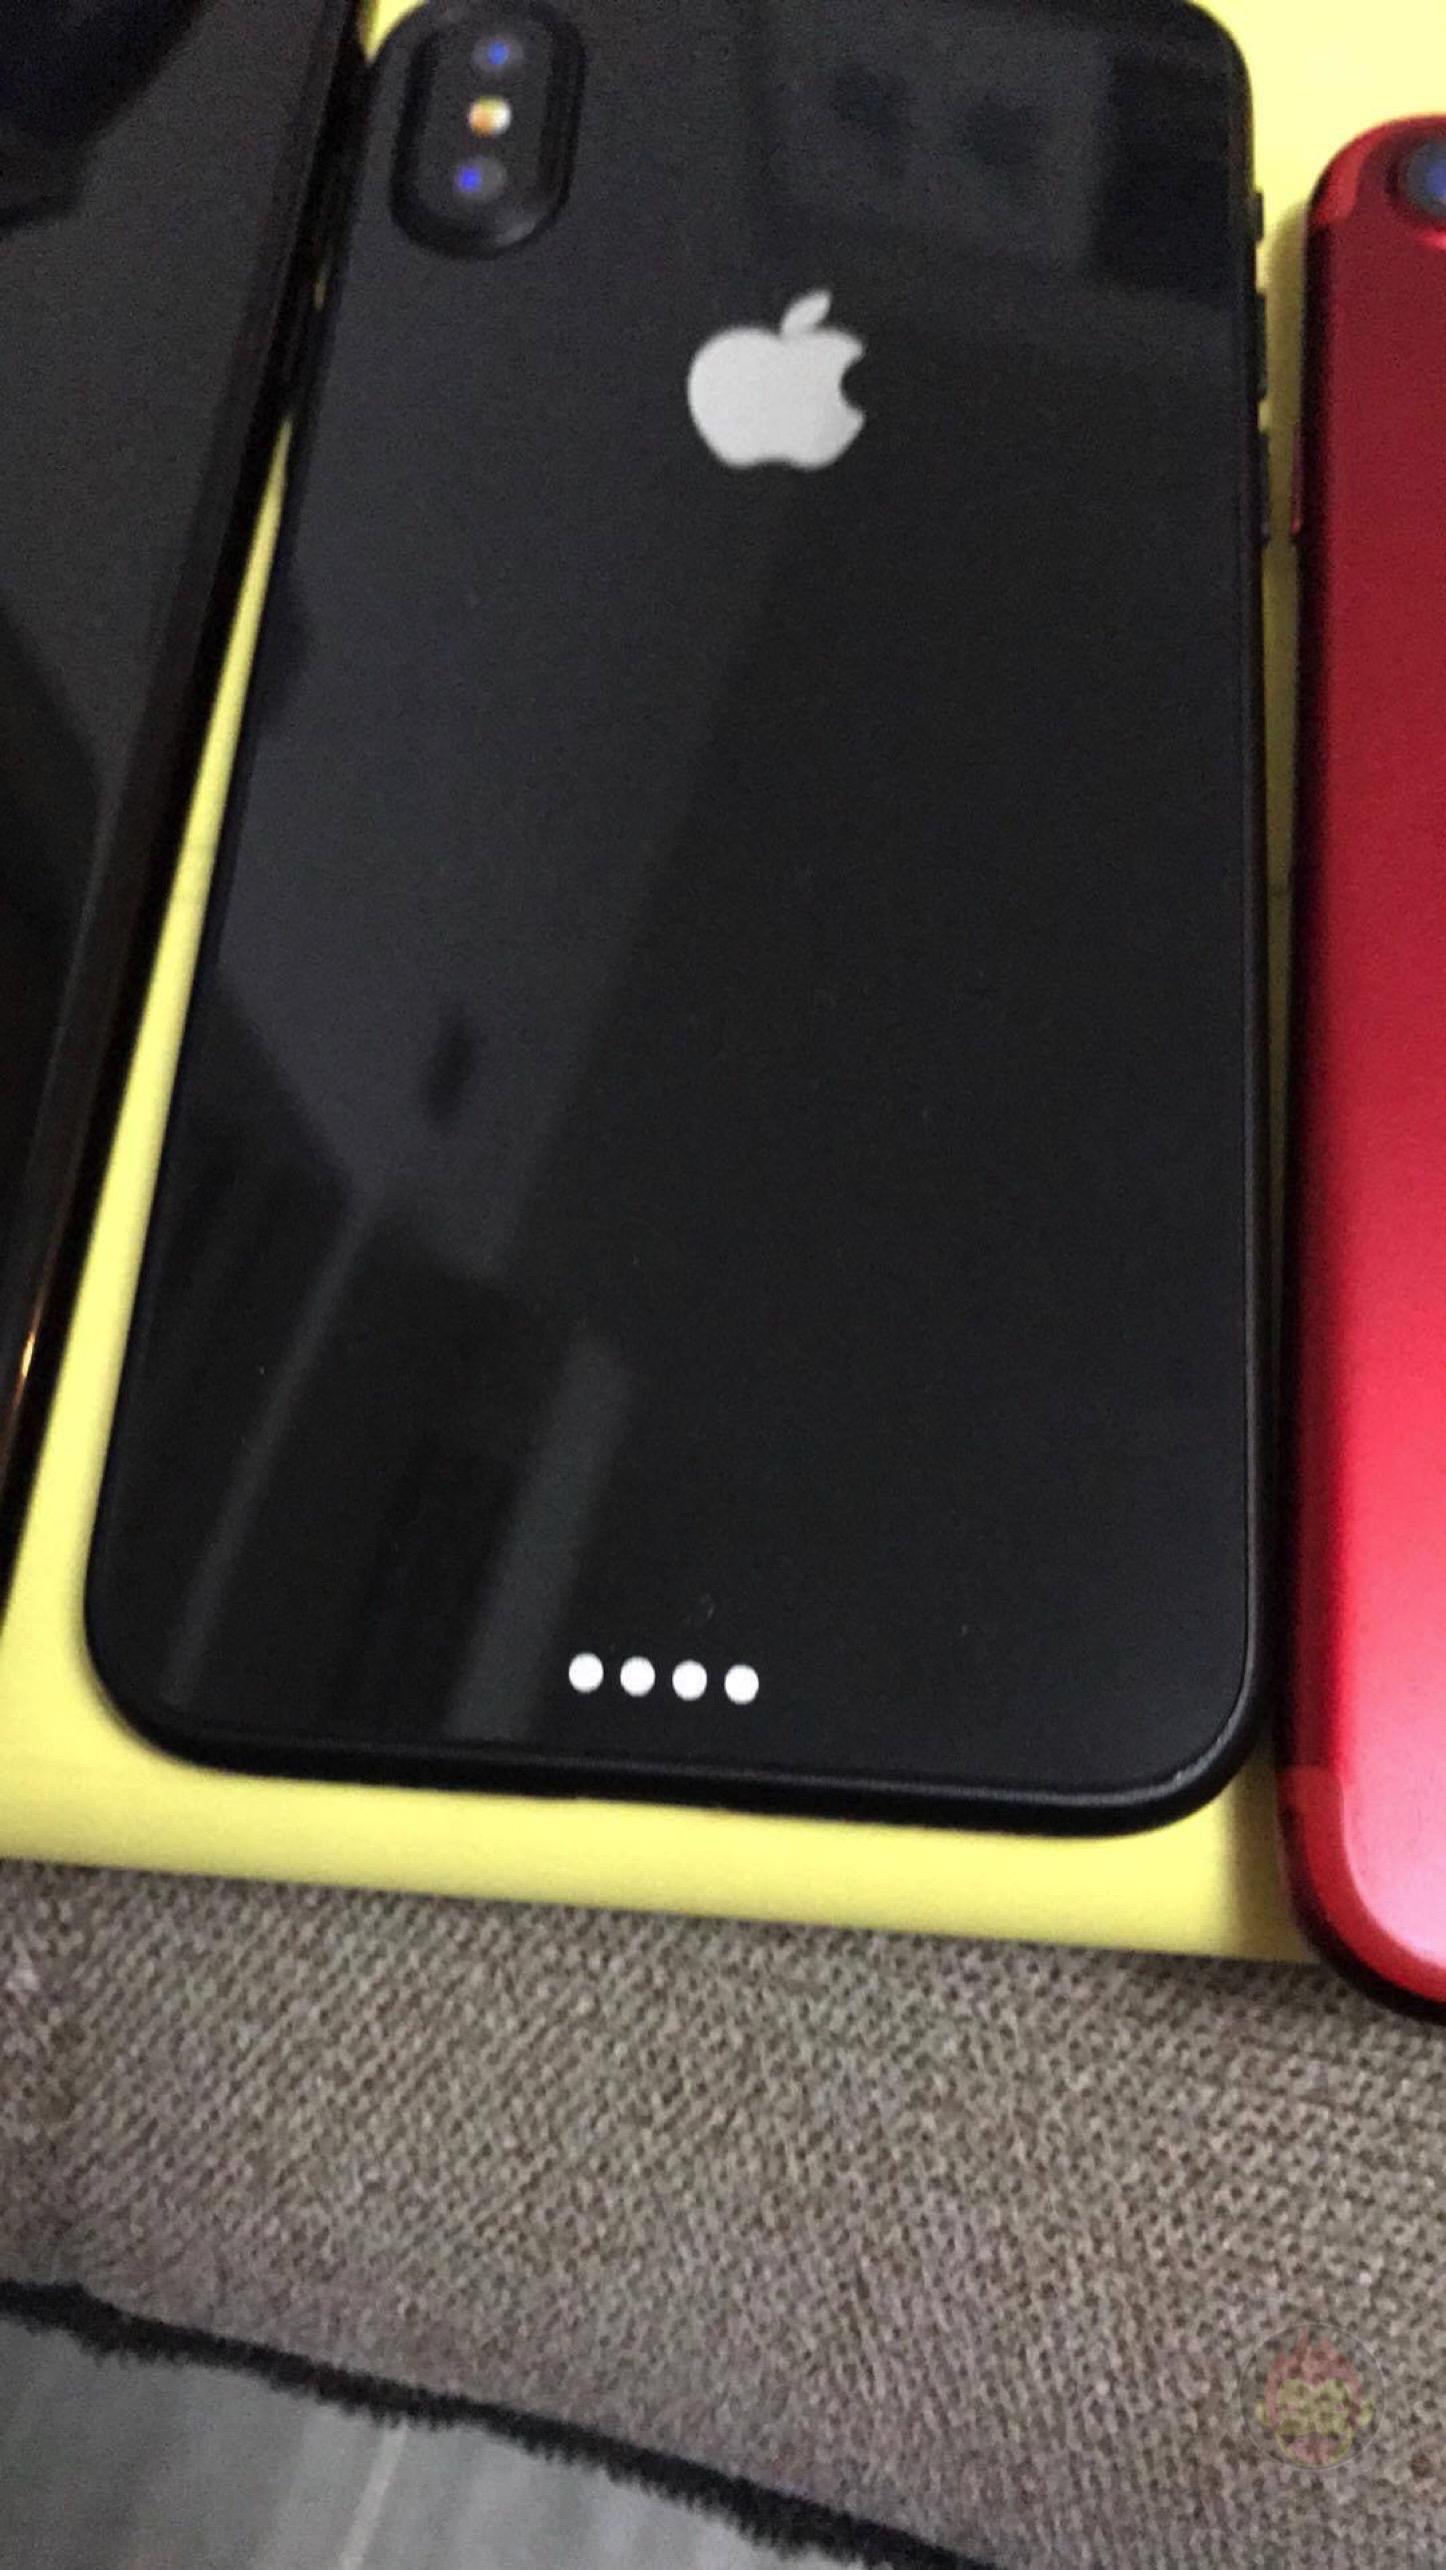 iPhone-Pro-8-Edition-Mockup-GoriMe-12.jpg